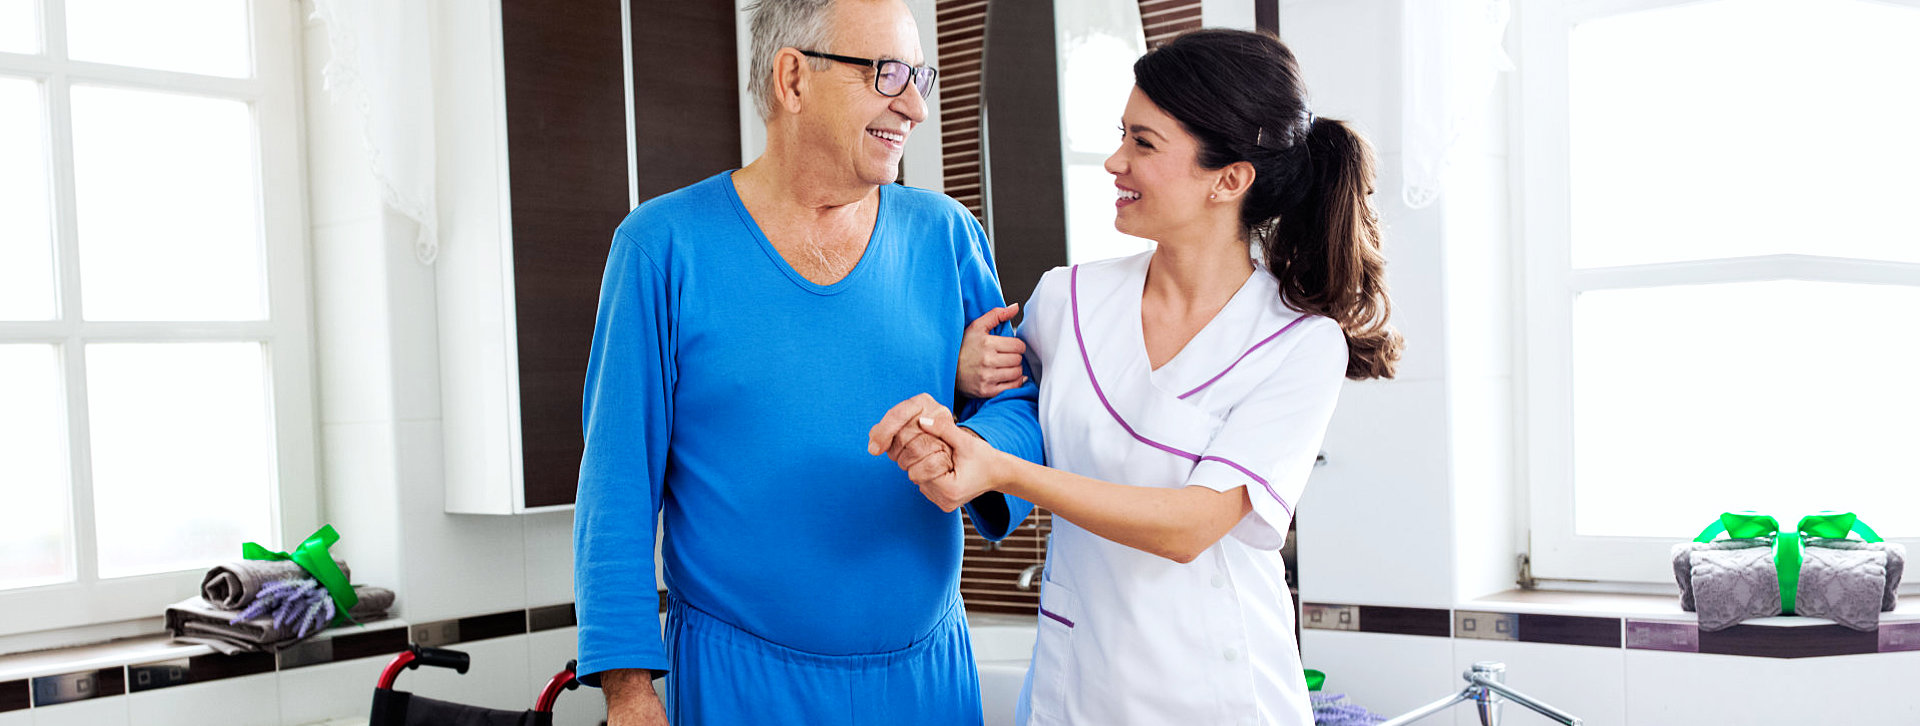 caregiver ang senior man smiling